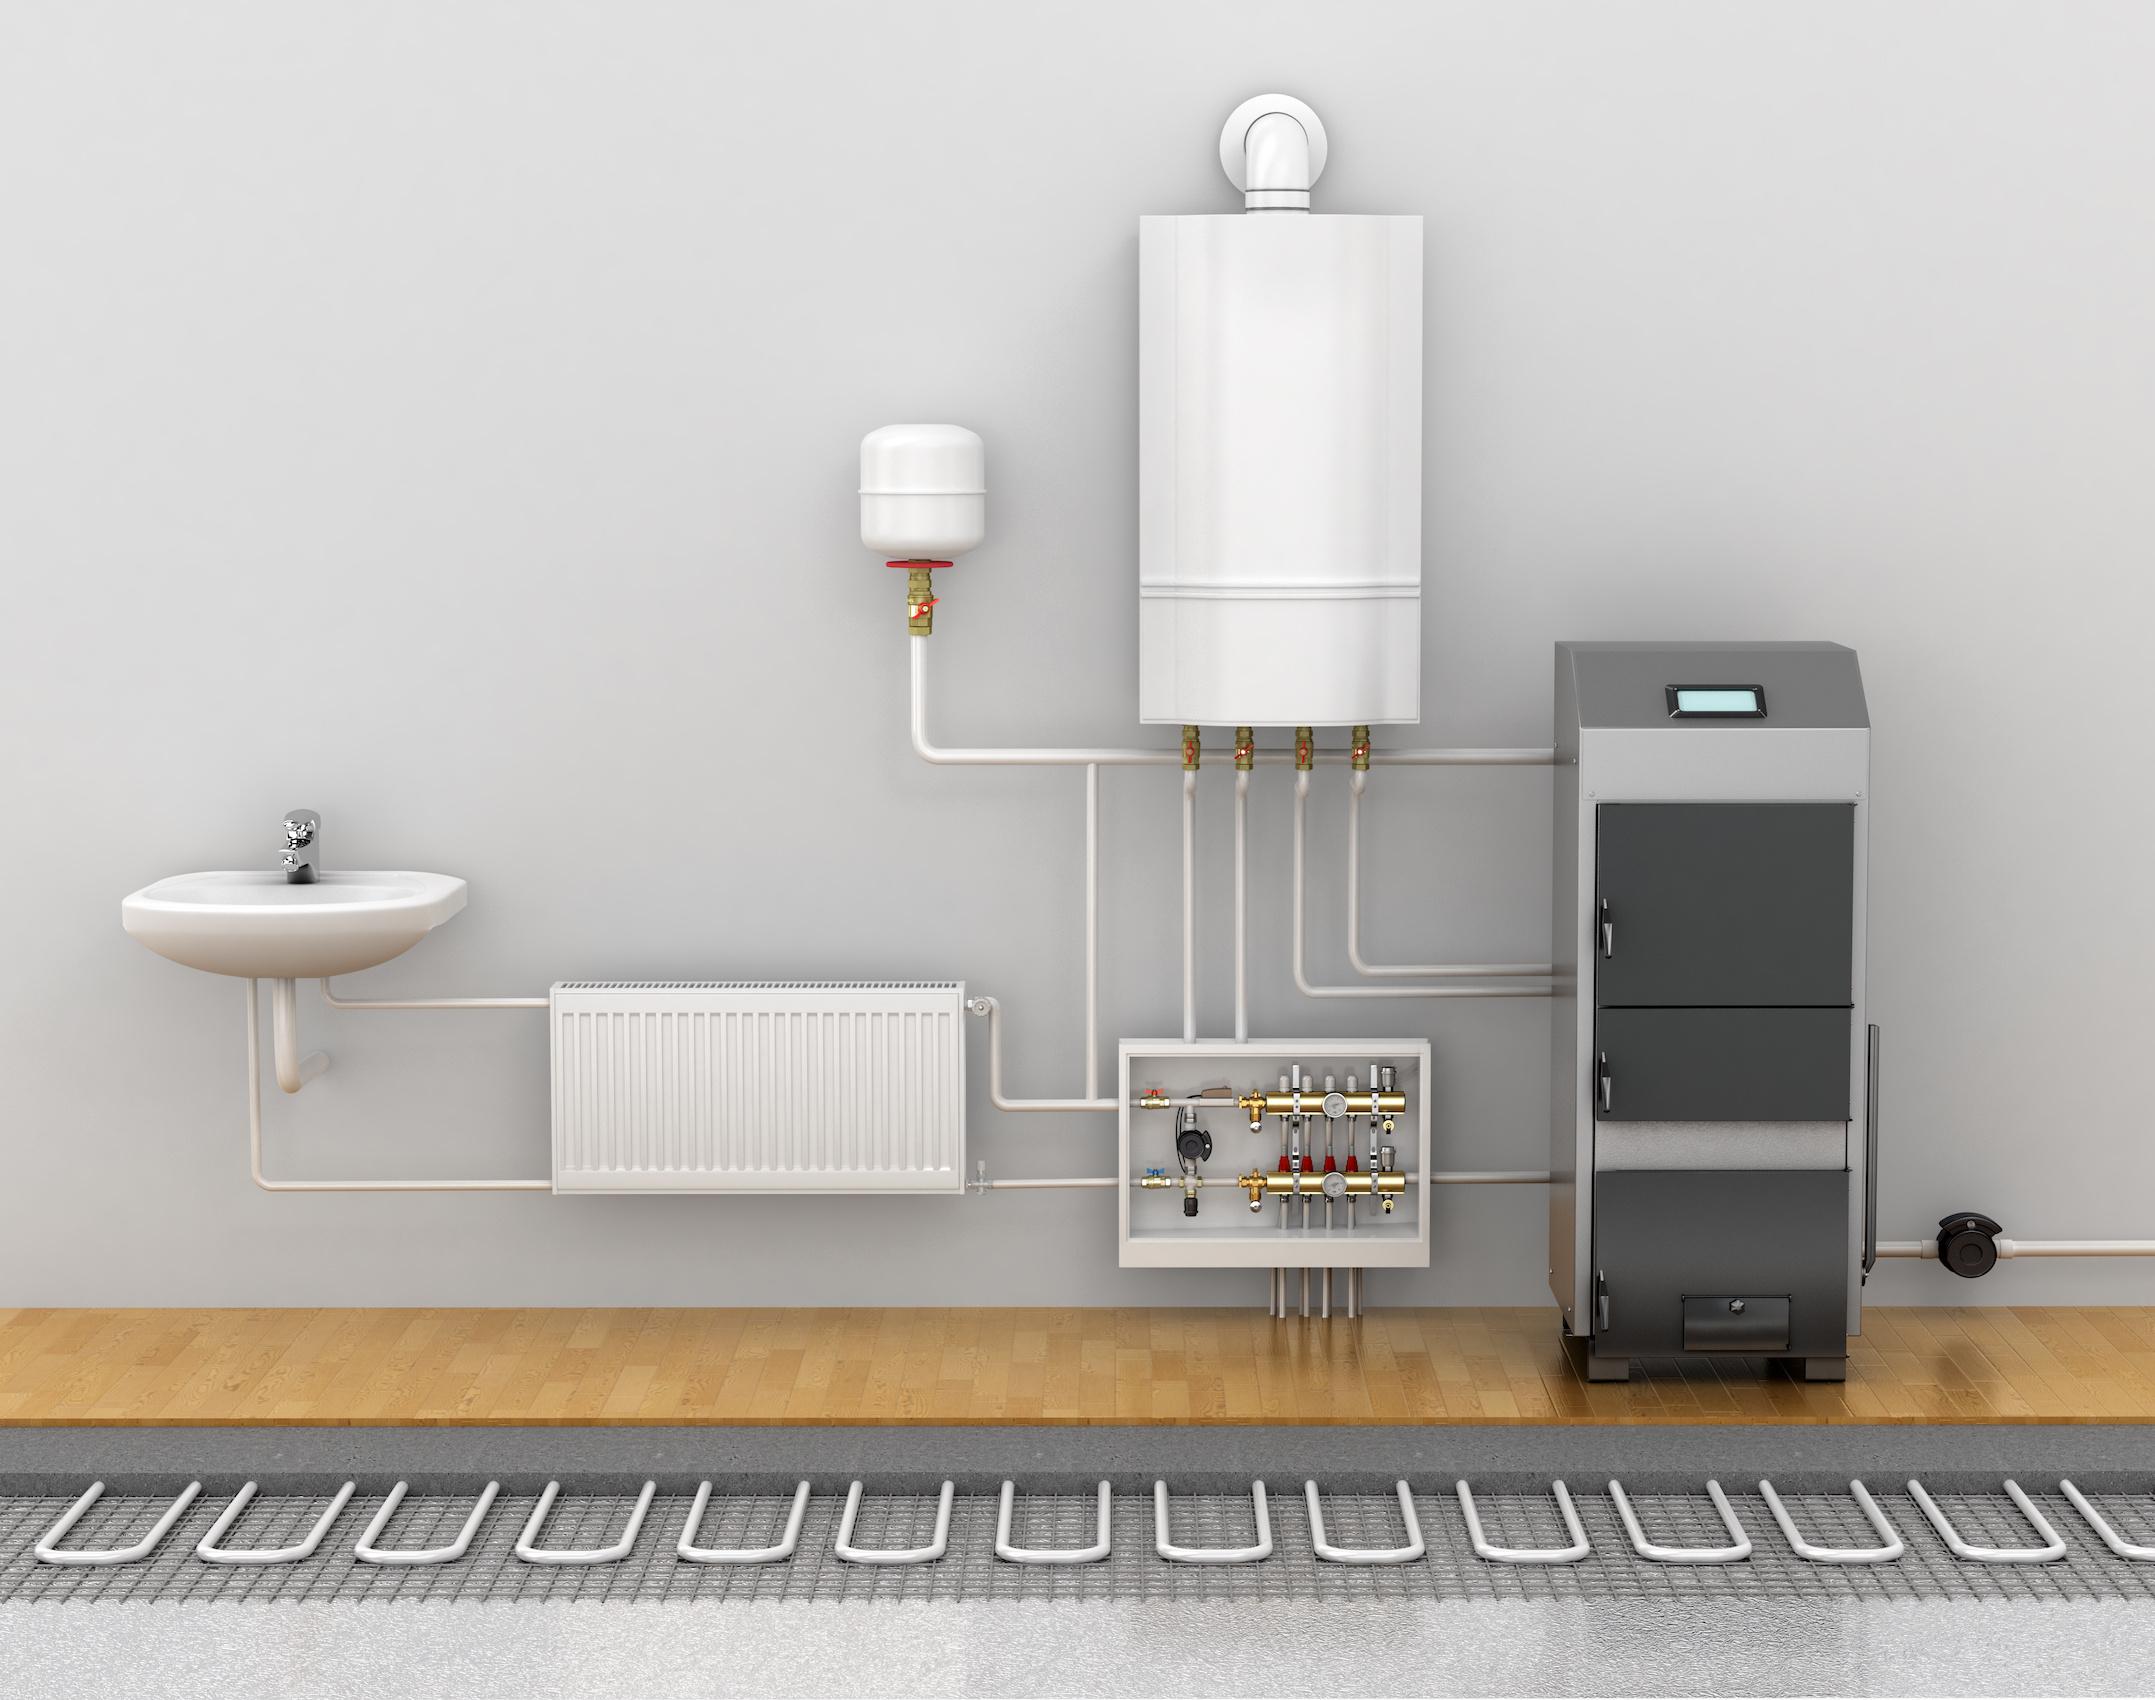 boiler replacement scheme